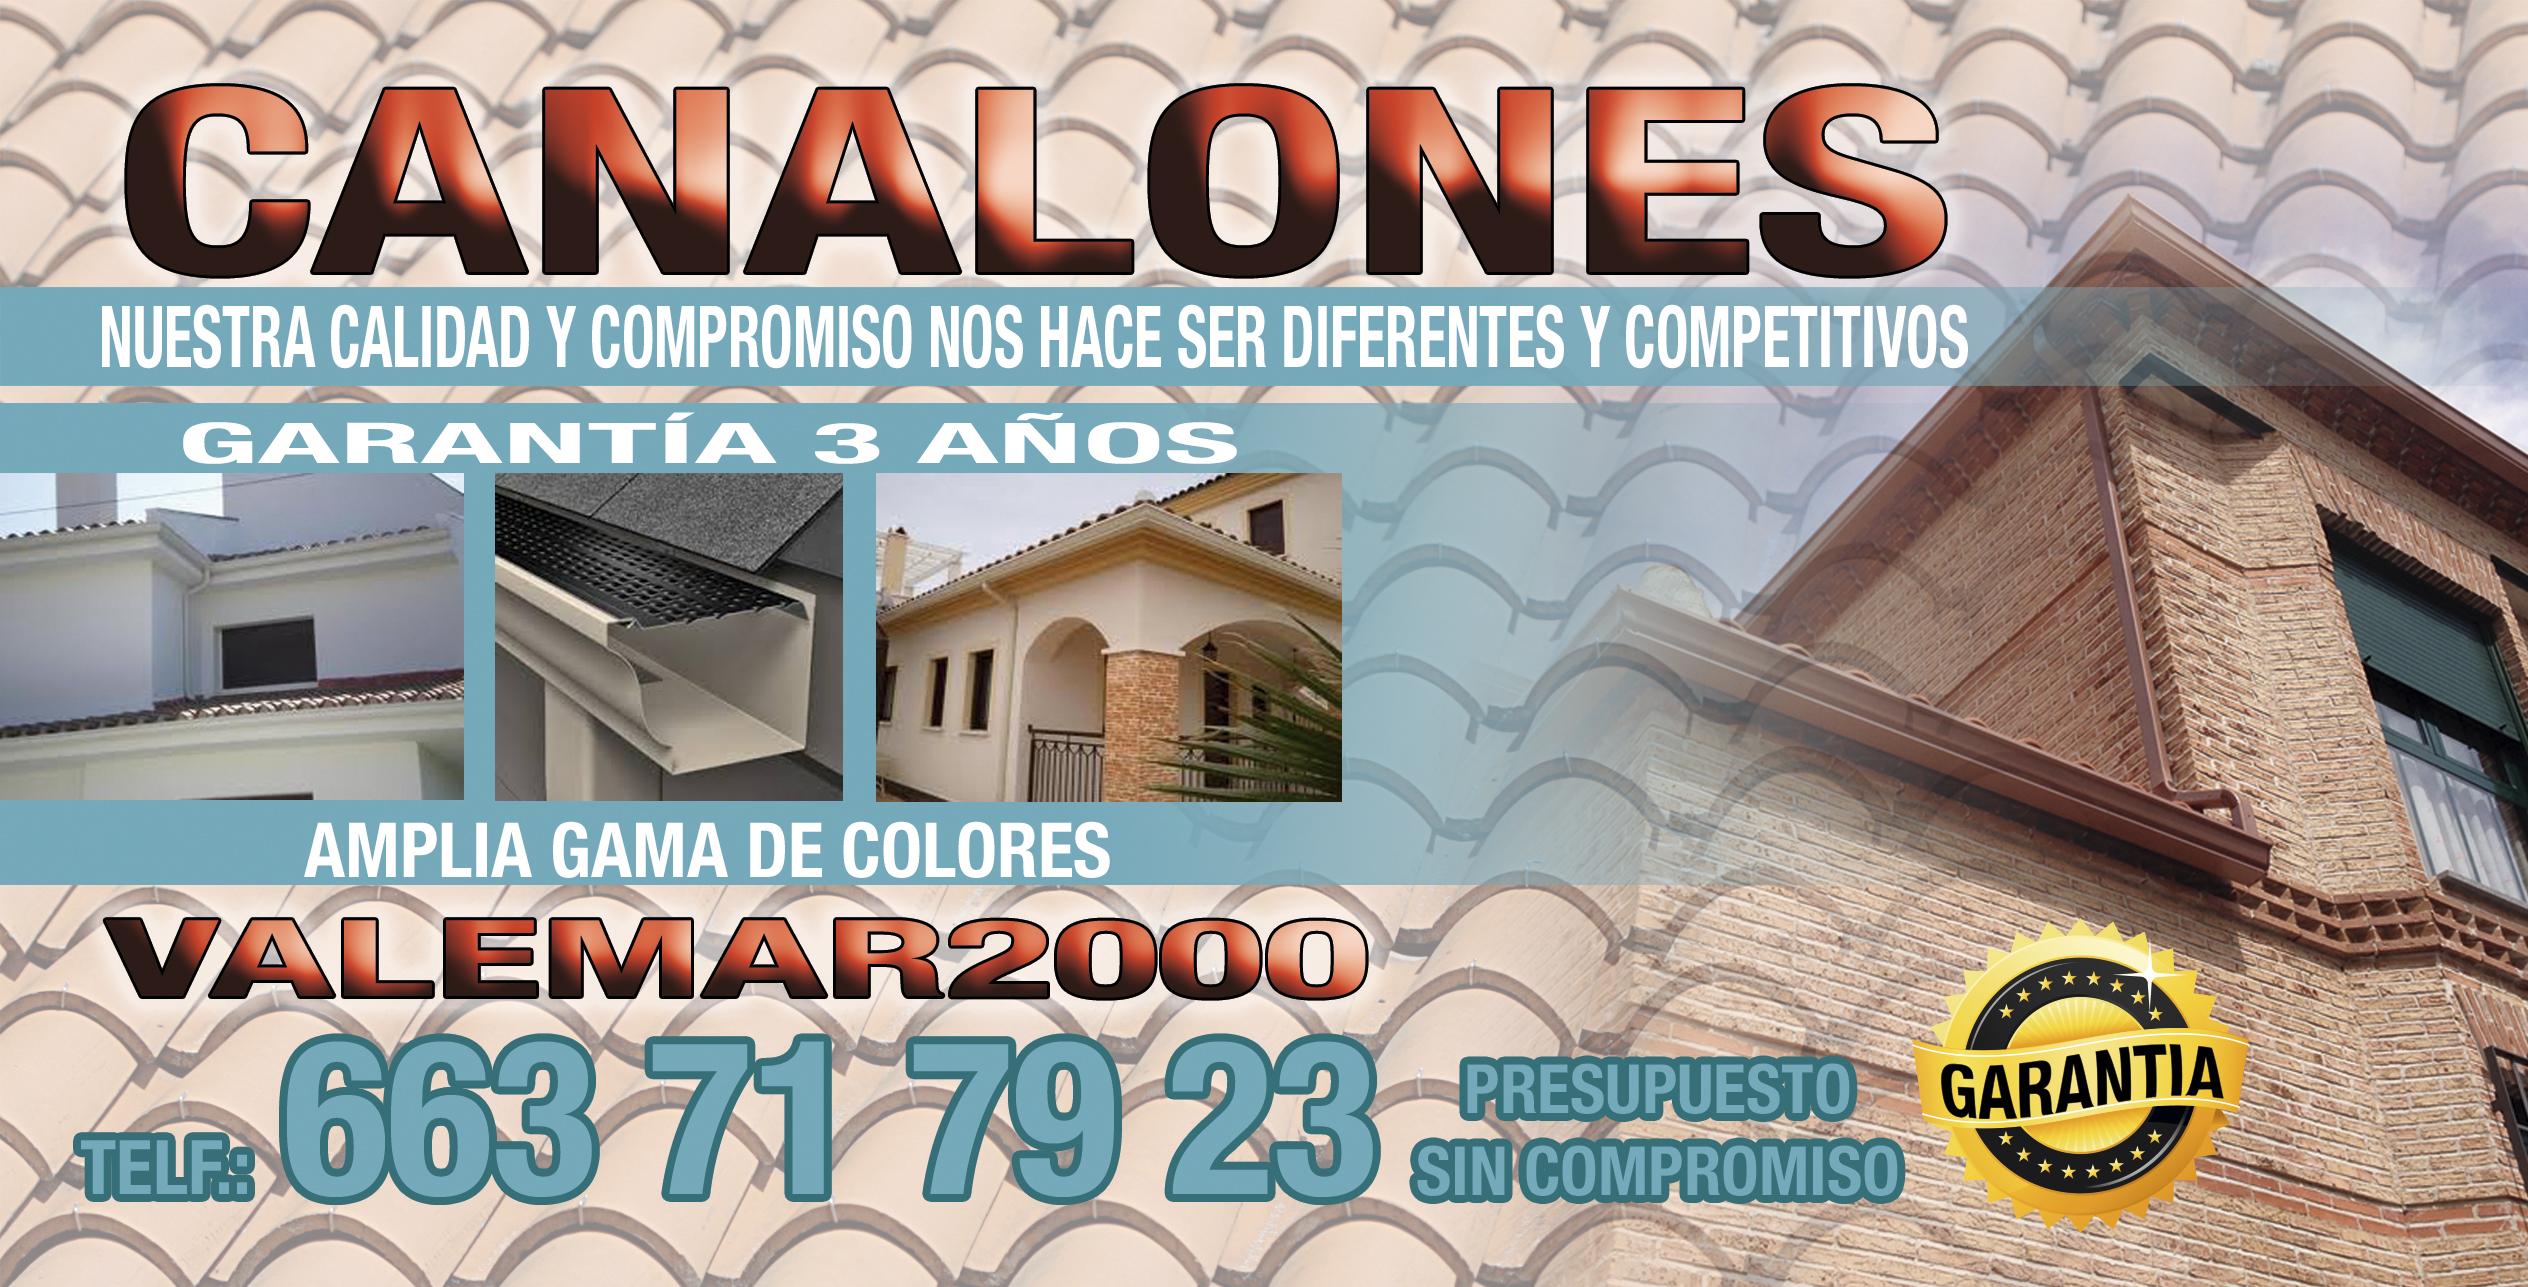 Canalones Valemar 2000